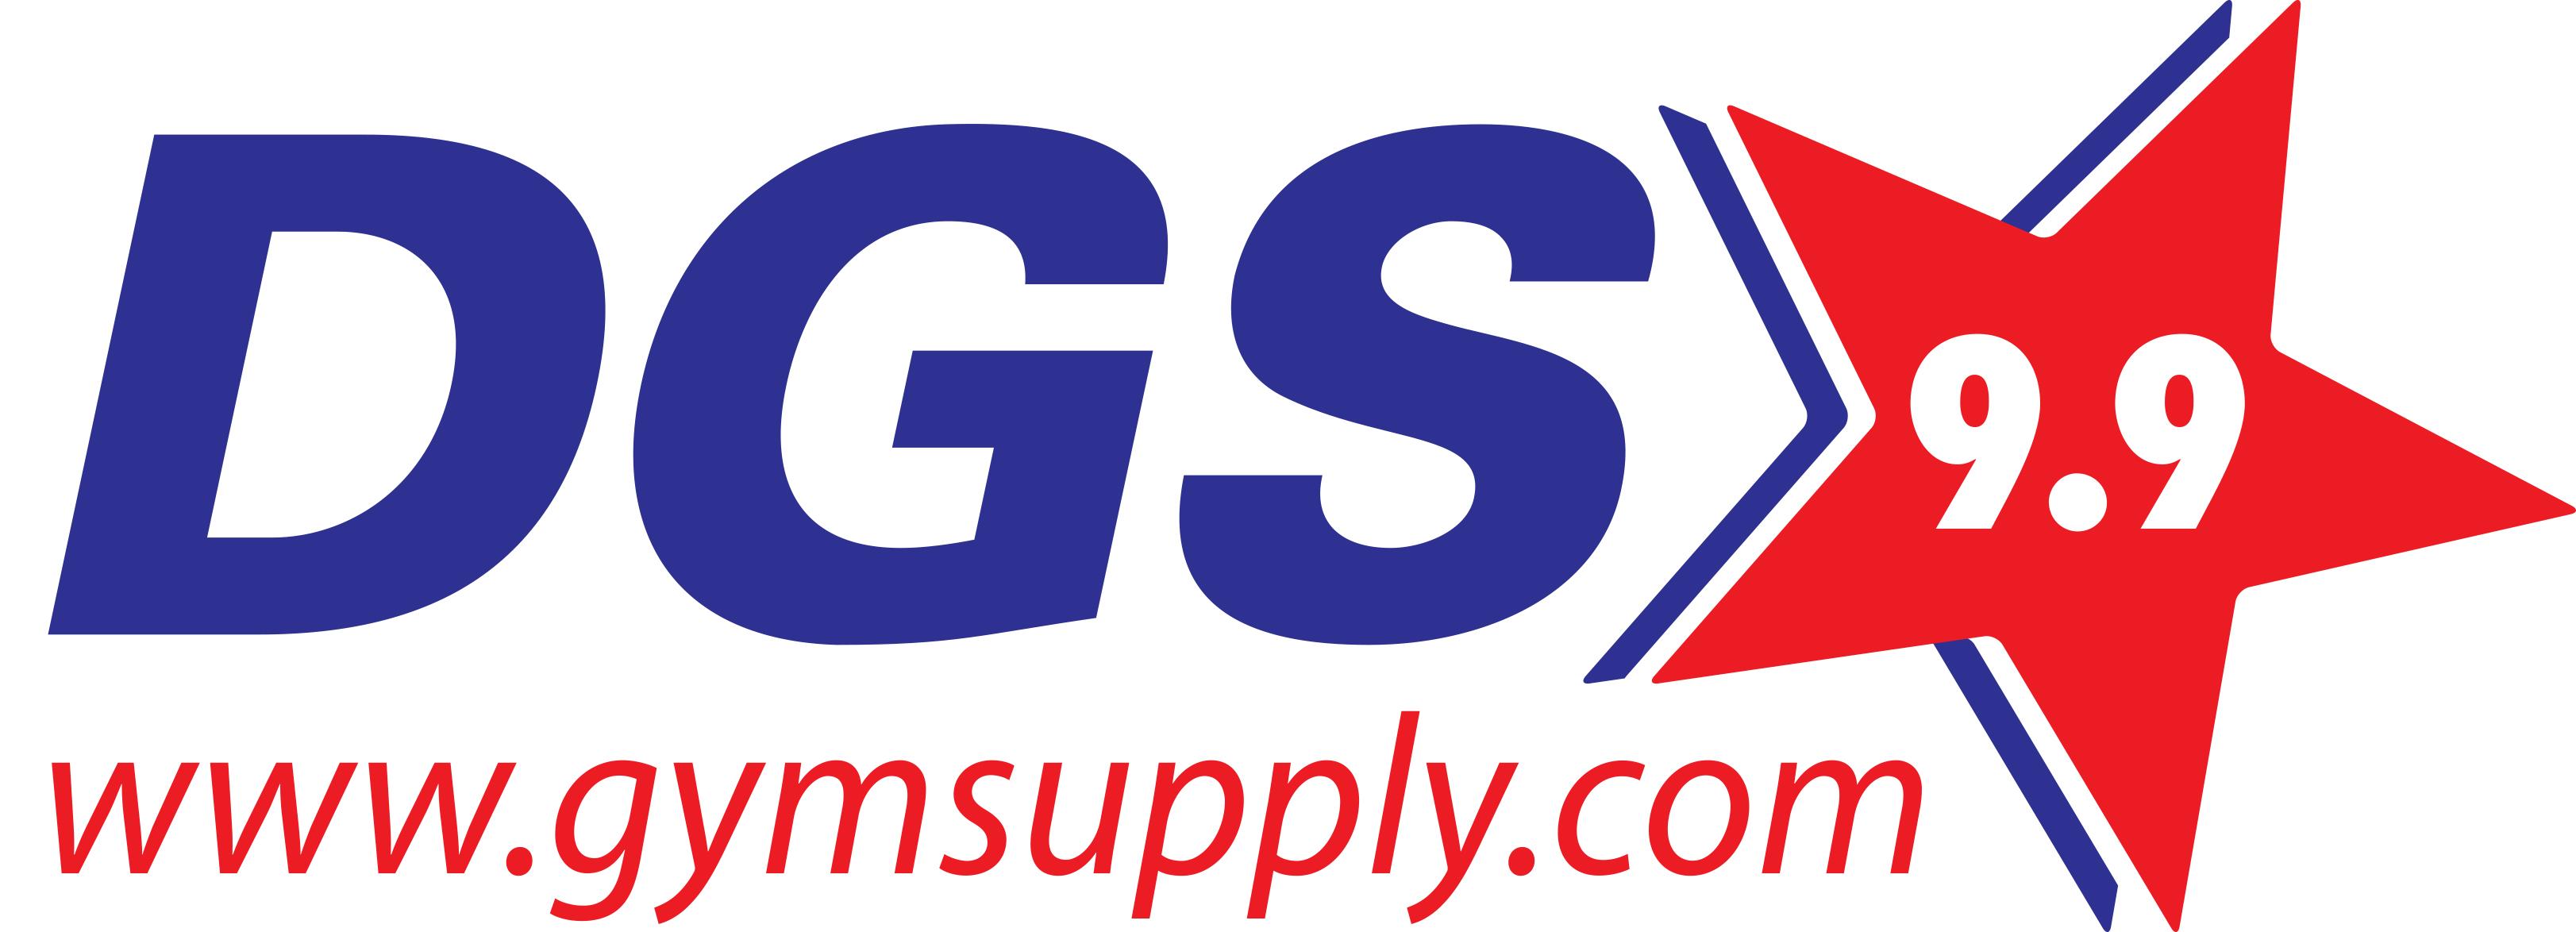 DGS Gym Supply